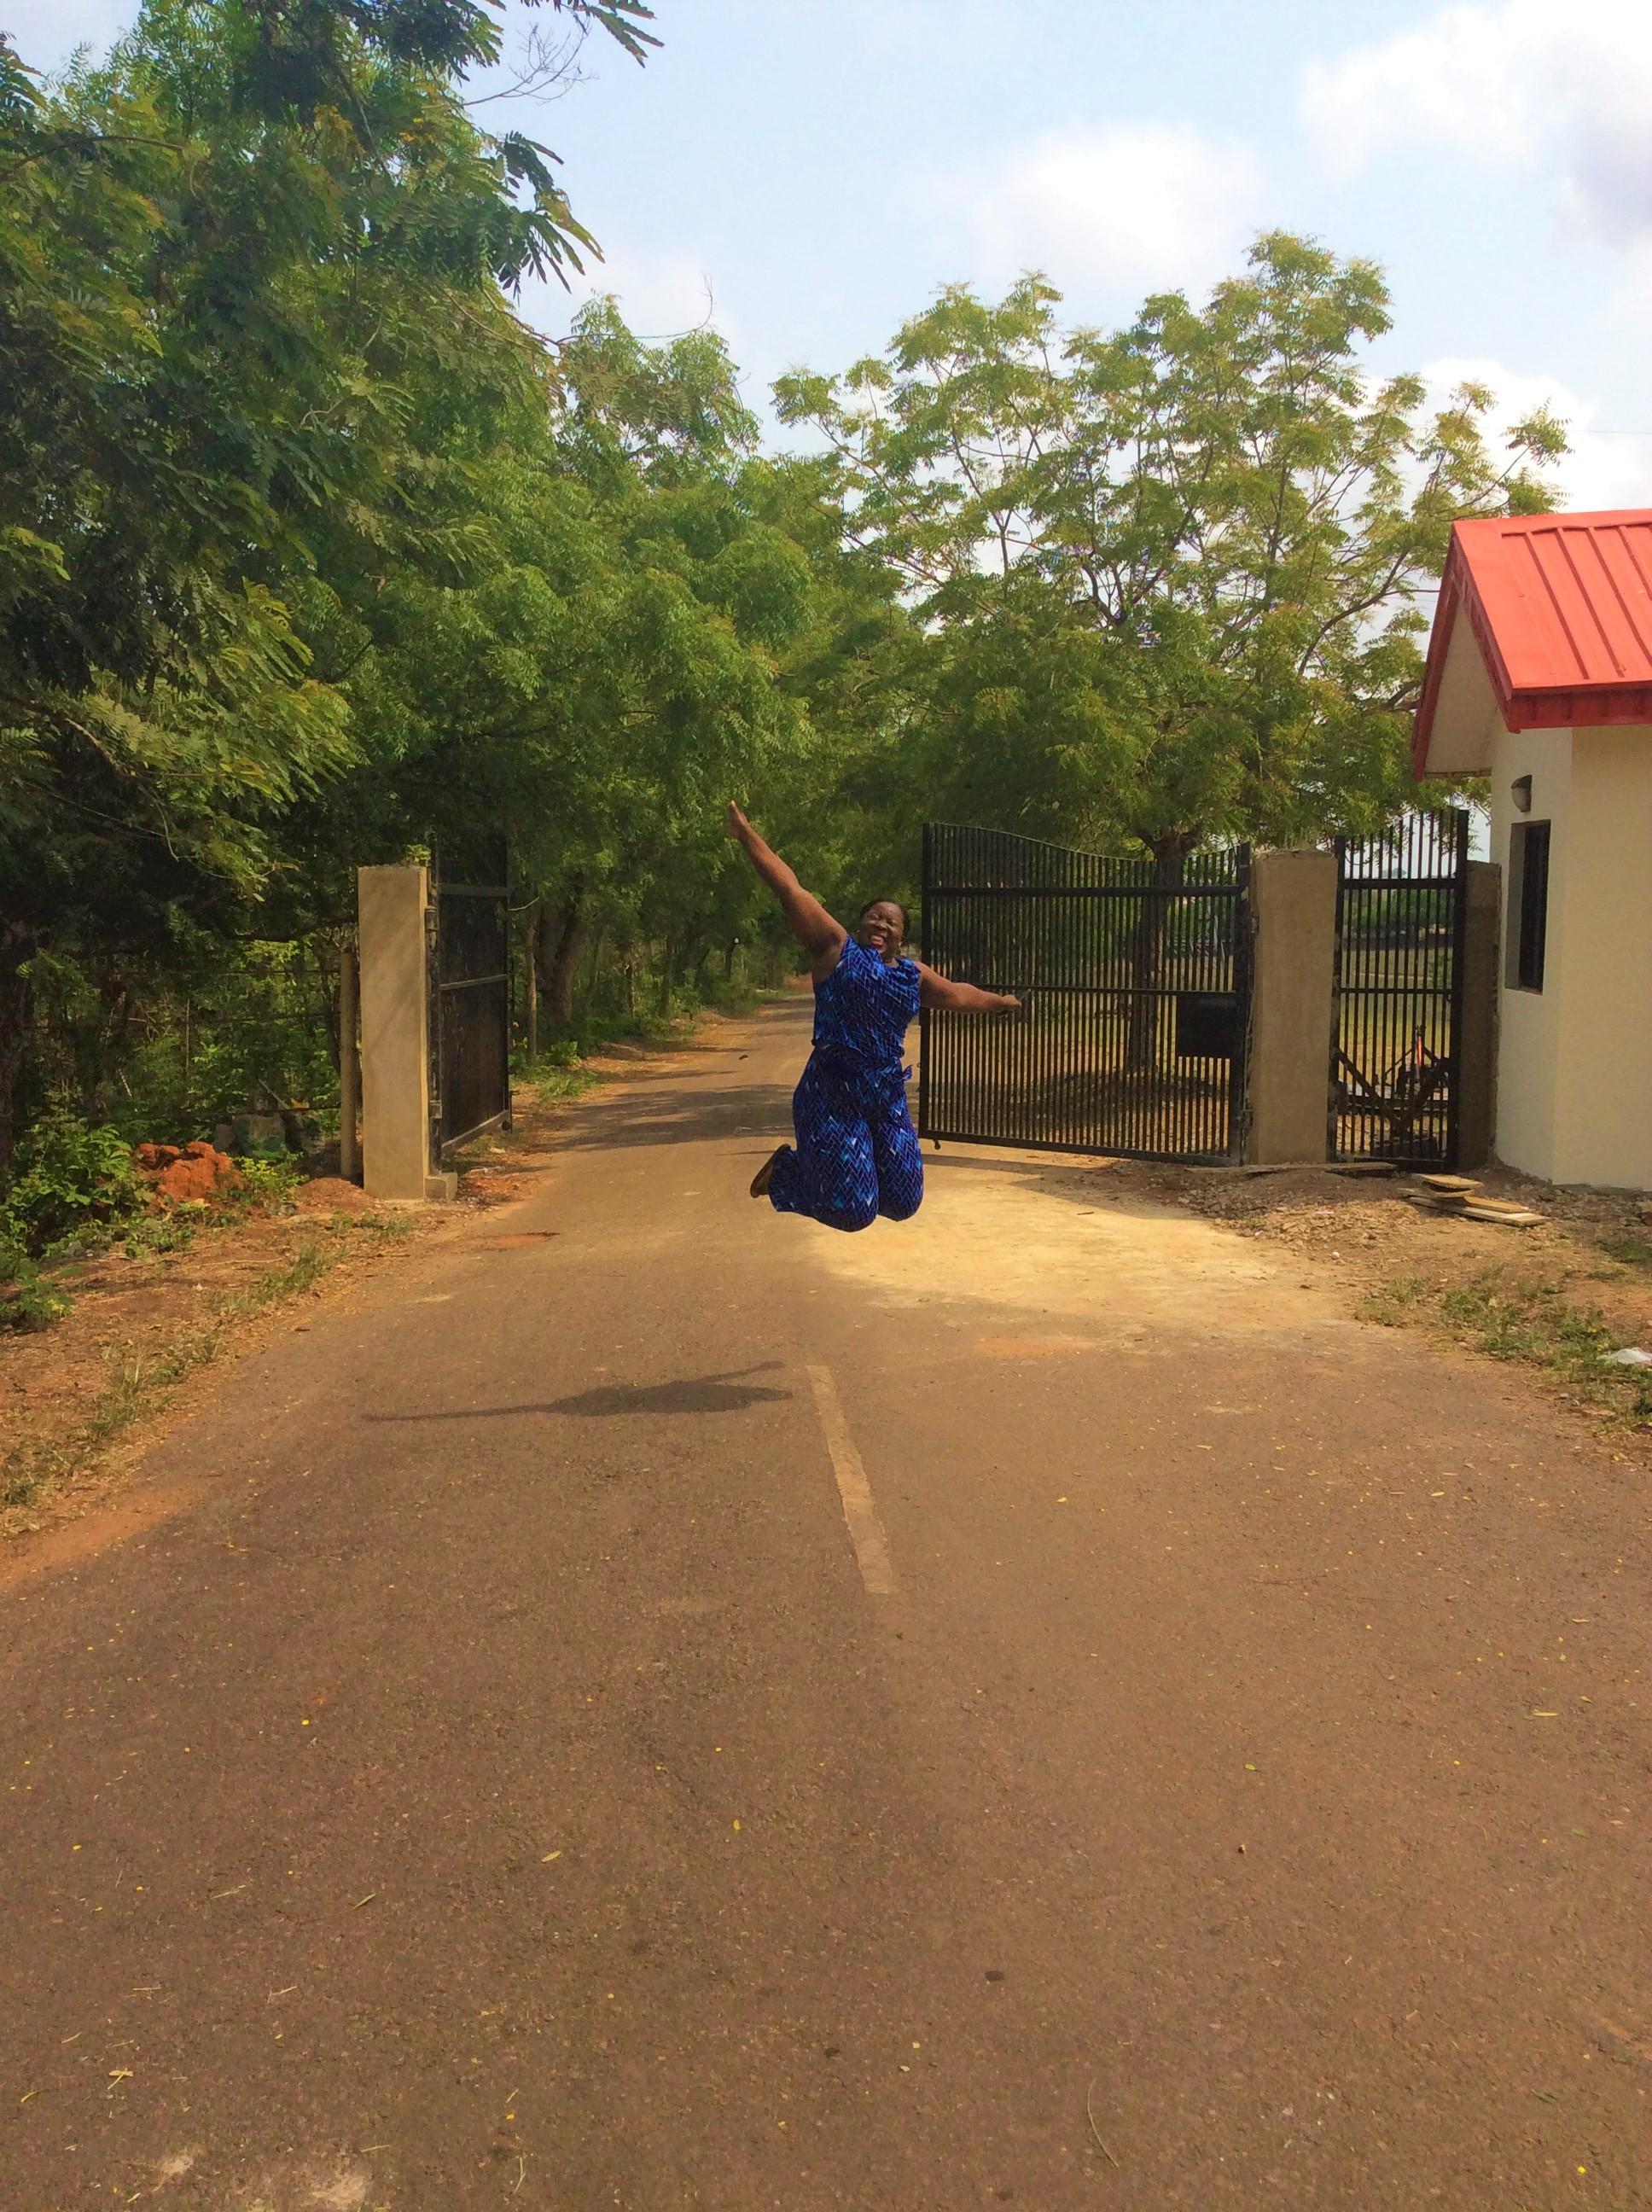 ABEOKUTA GOLF RESORT | The Ajala Bug